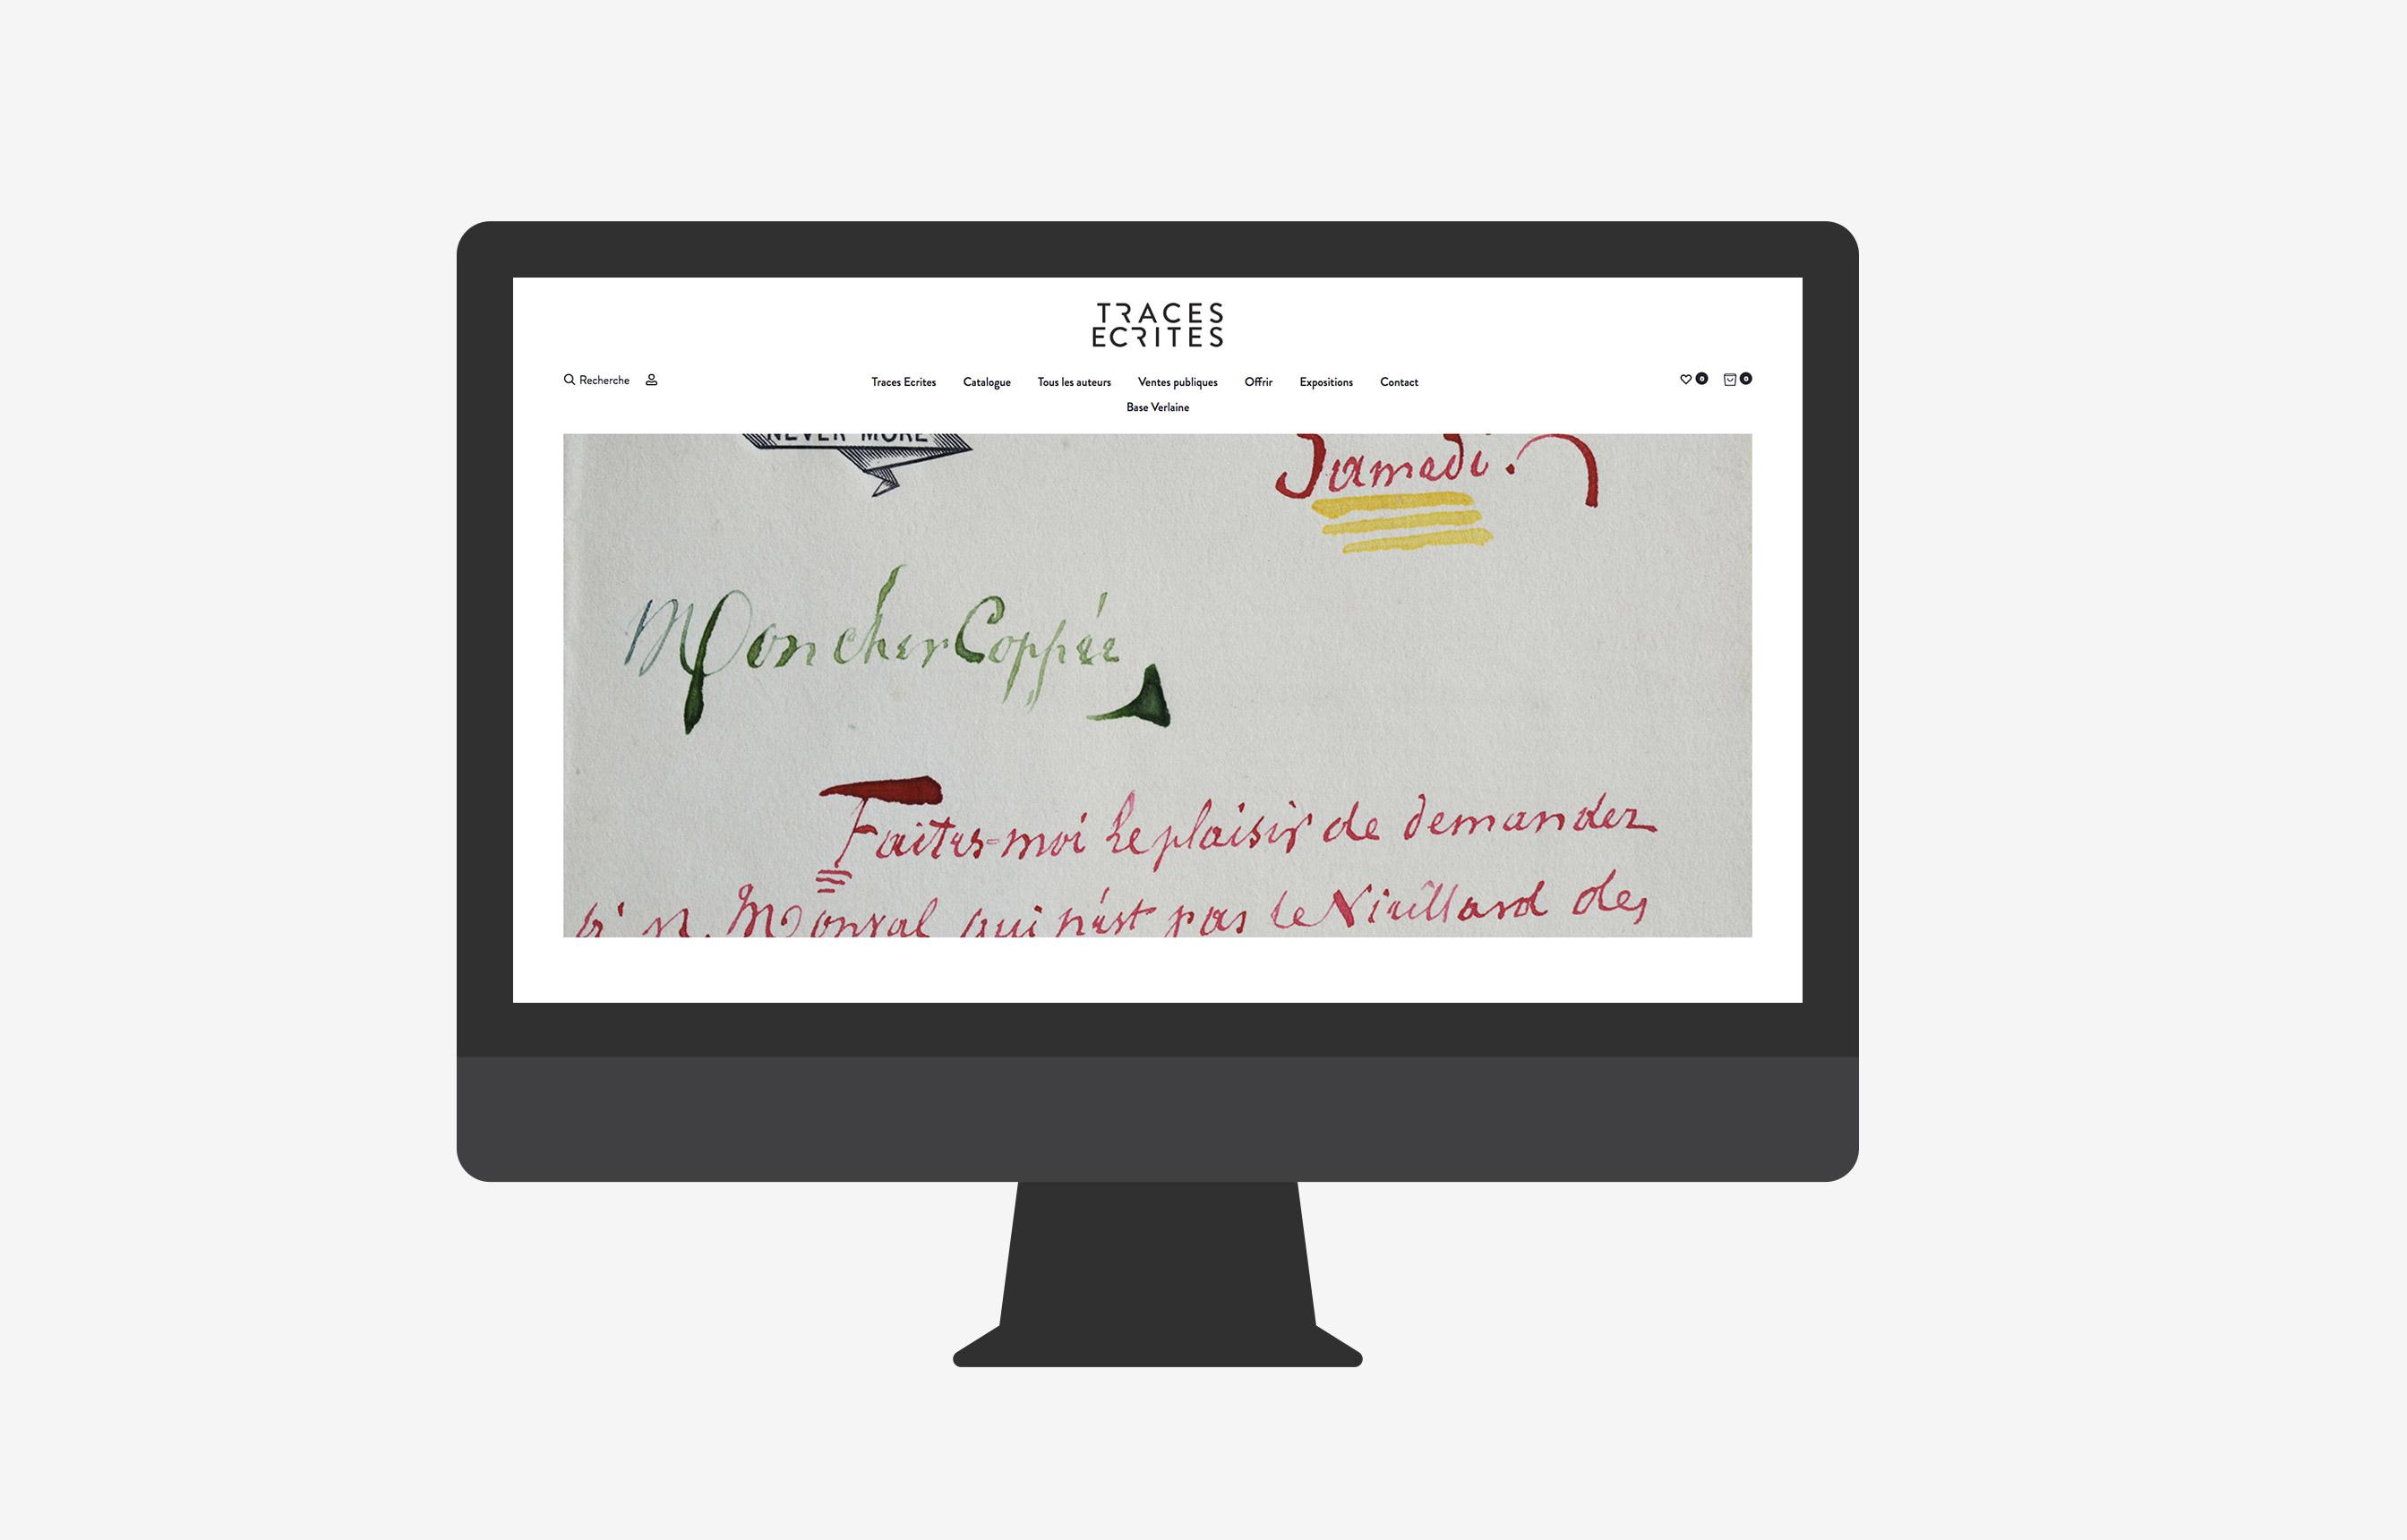 03-traces-ecrites-pikteo-webdesign-graphic-design-freelance-paris-bruxelles-londres